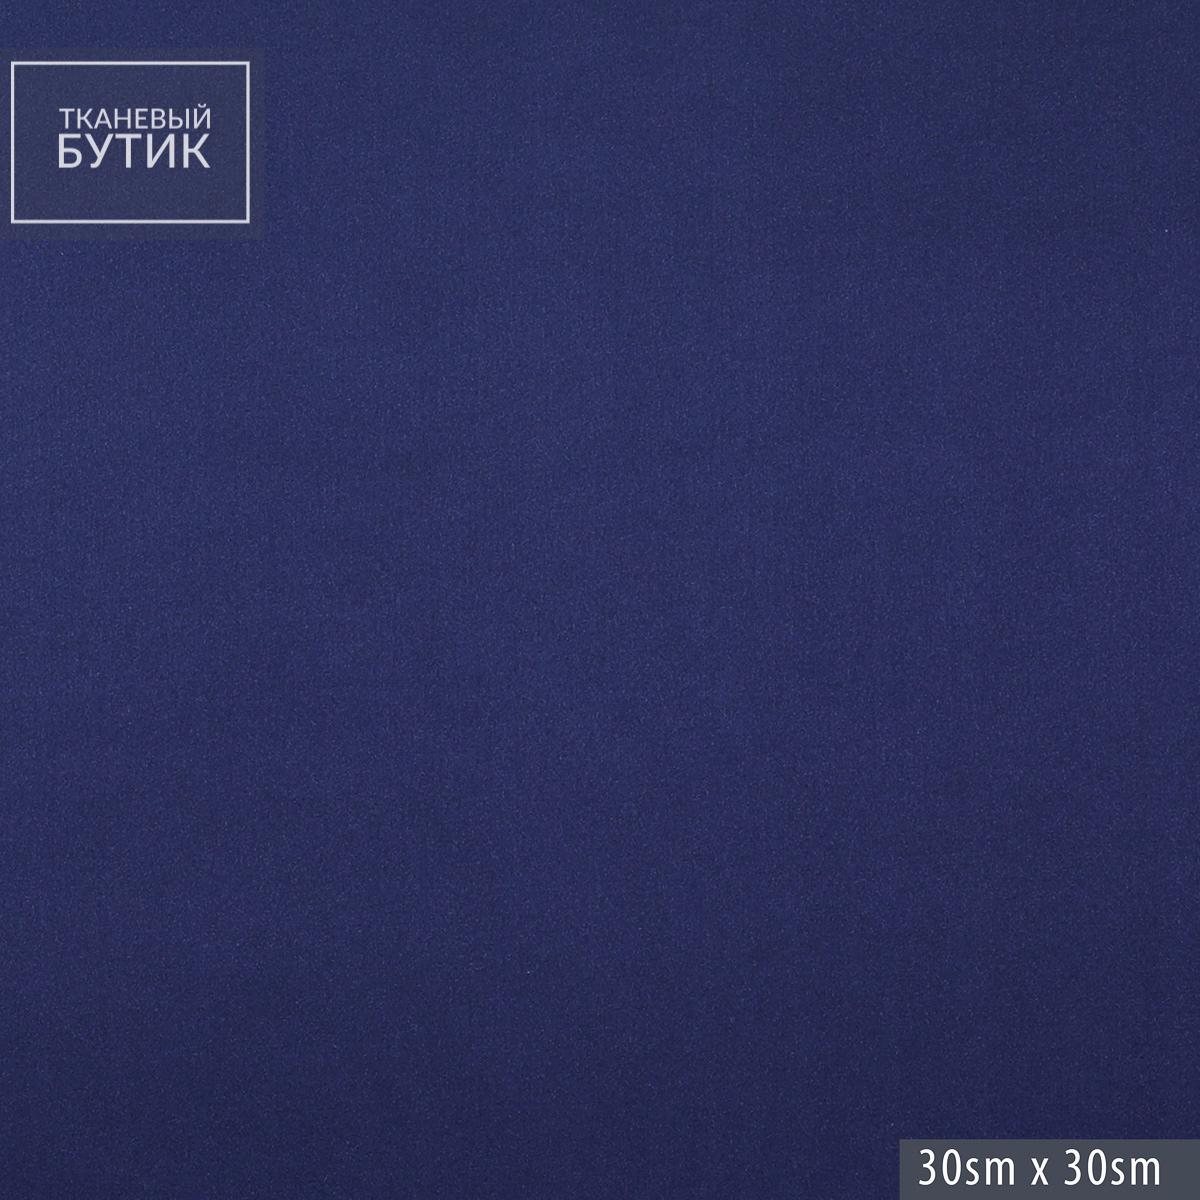 Темно-синий атласный шелк